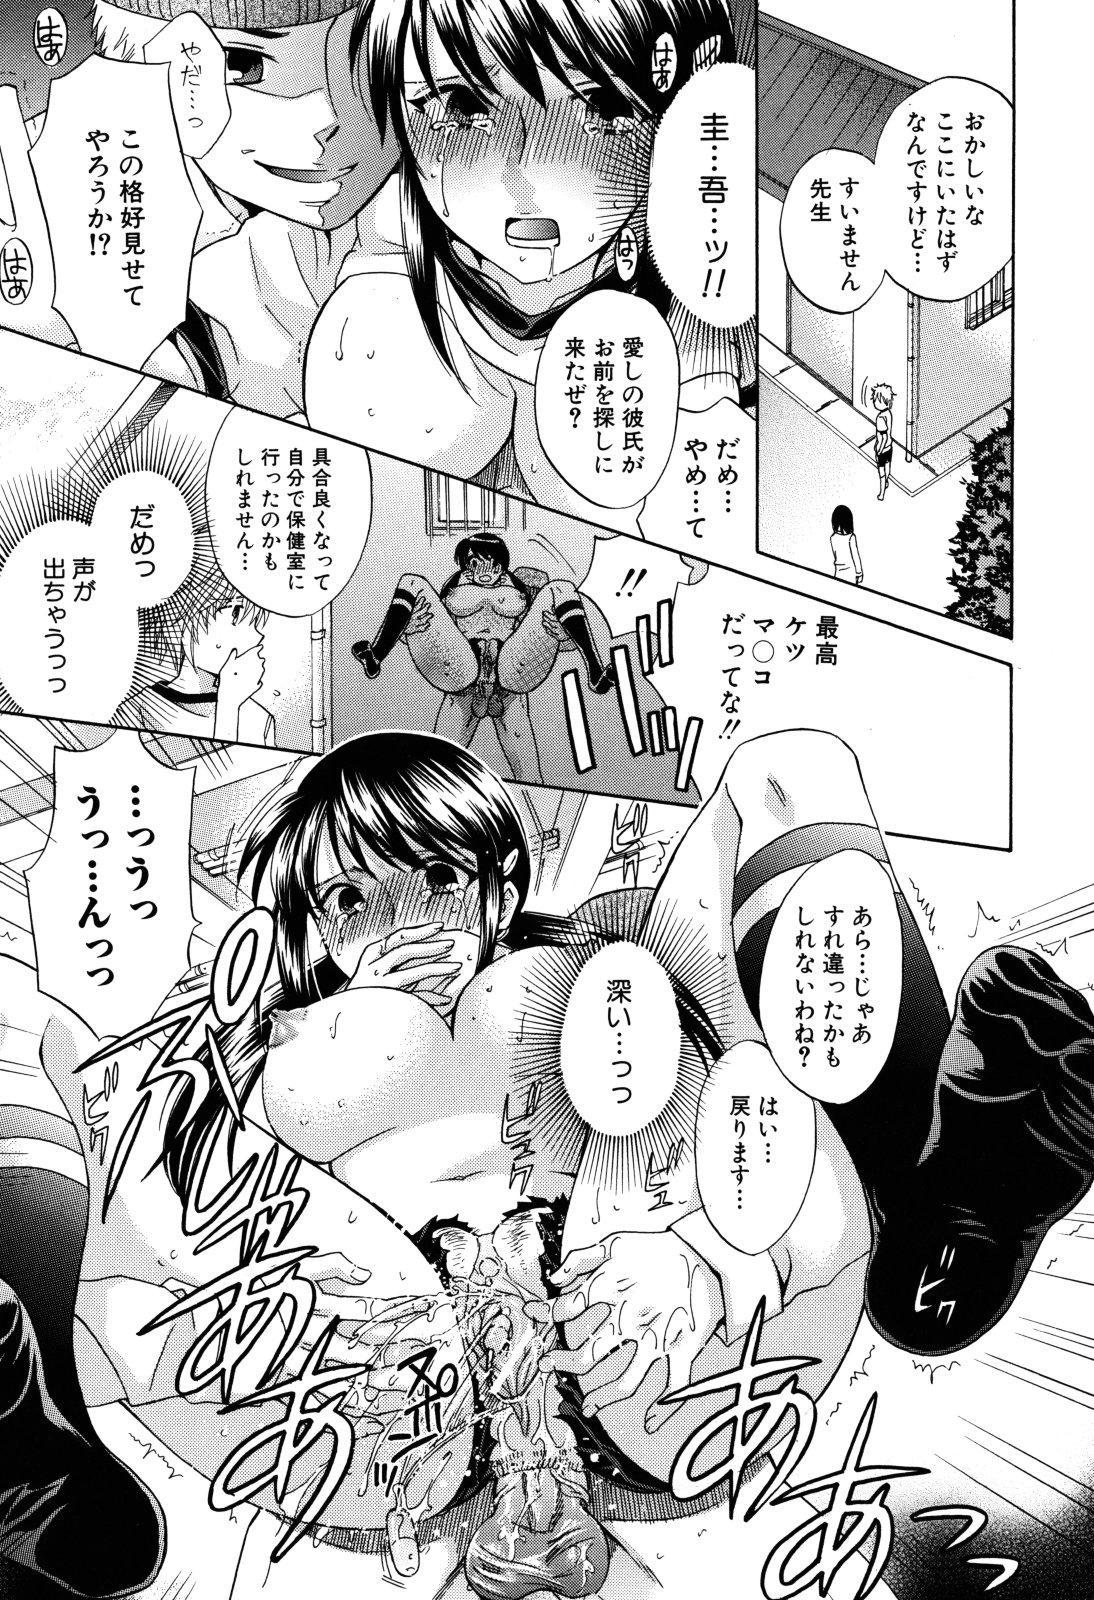 Kanojo ga Ochiru made - She in the depth 176